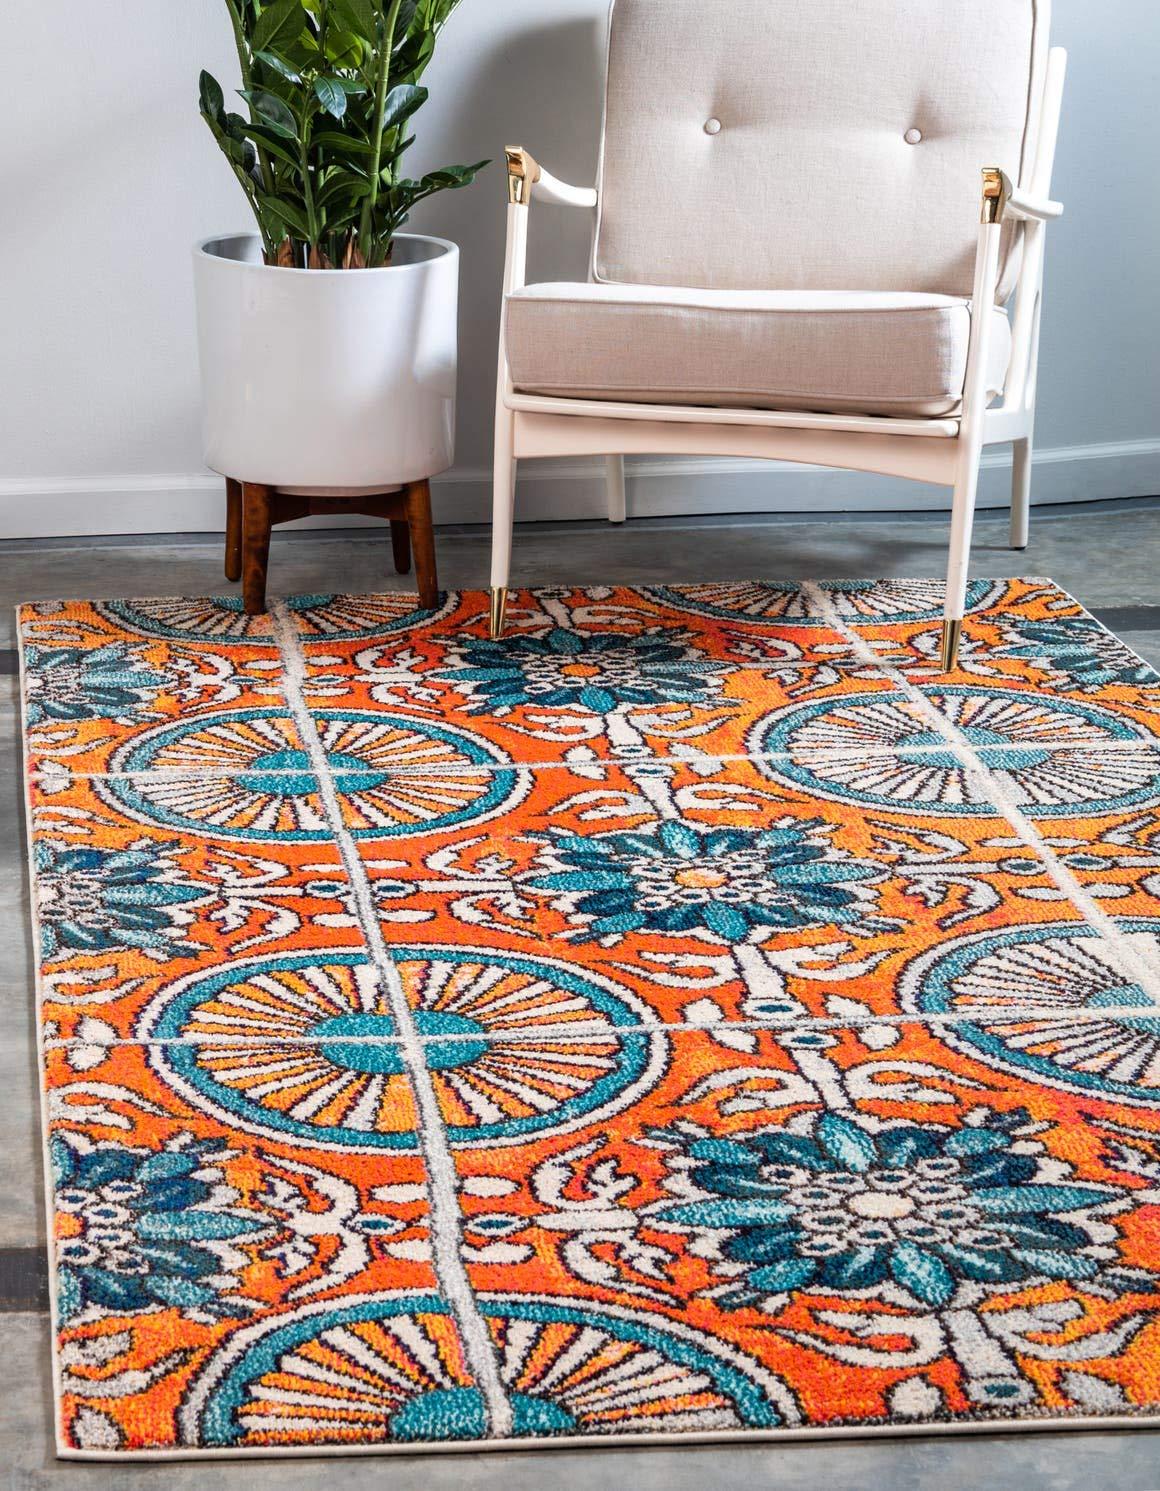 Unique Loom Estrella Collection Vibrant Abstract Orange Area Rug 3 3 x 5 3